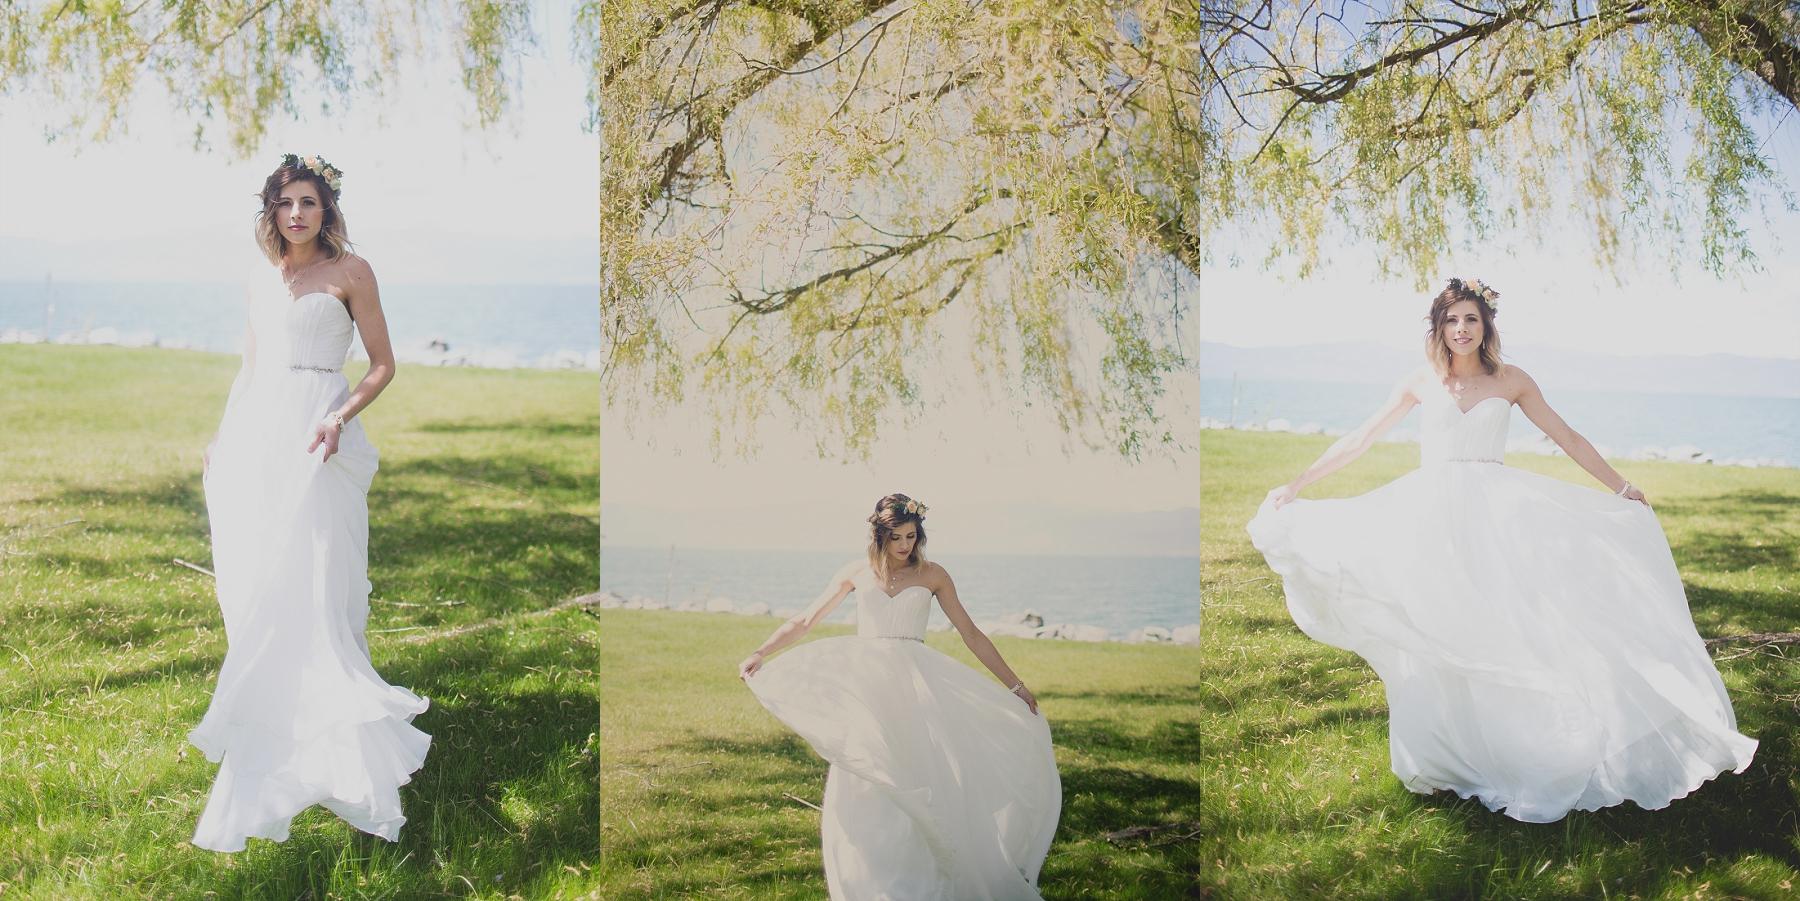 Jennifer_Mooney_Photo_Flathead_Lake_Lodge_Styled_Shoot_00074 - Copy.jpg